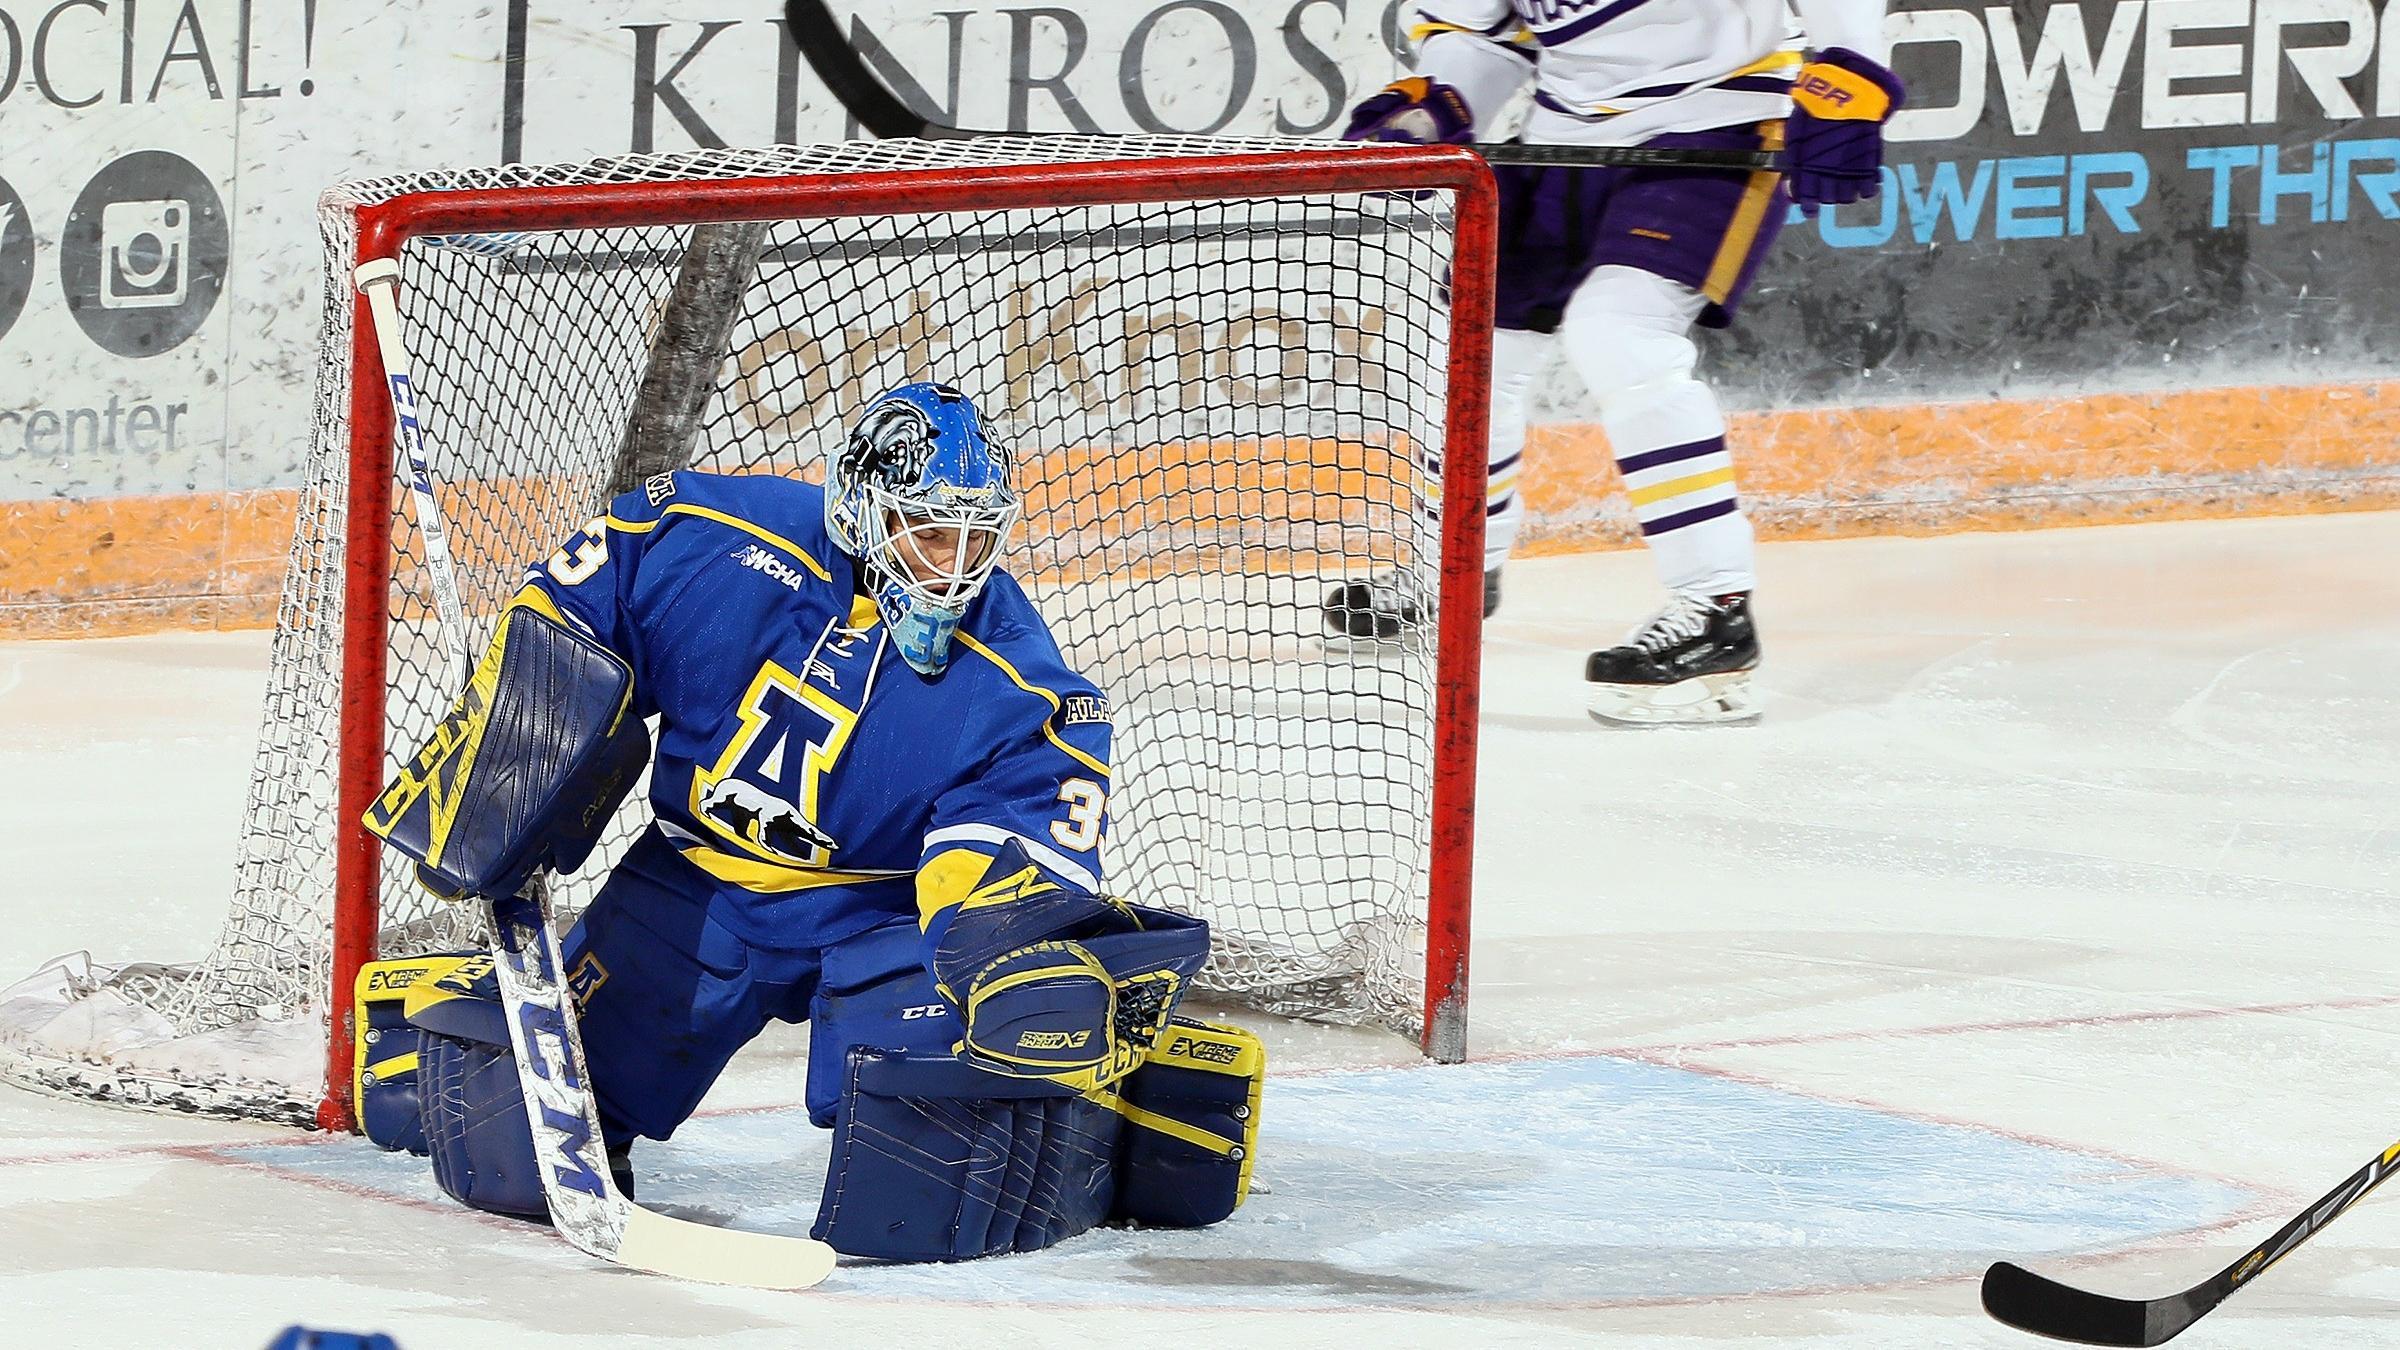 Anton Martinsson shut down Alaska Anchorage with his second shutout of the season.